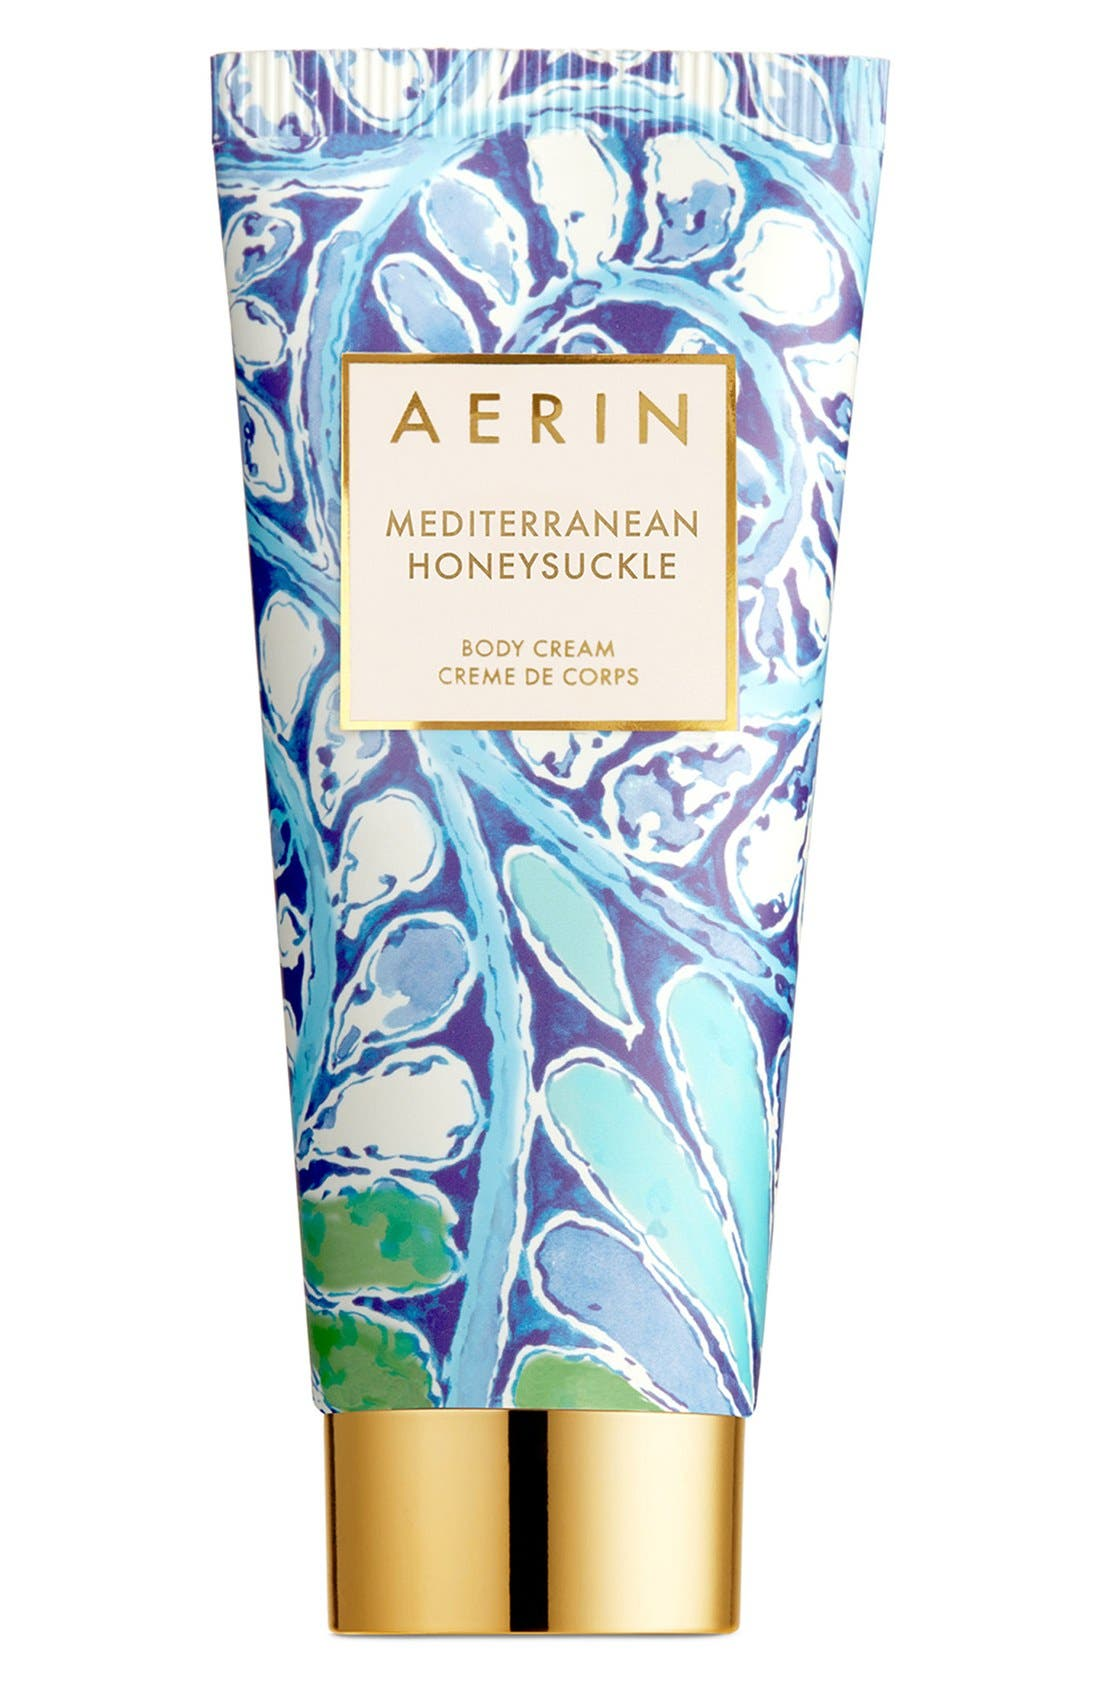 AERIN Beauty Mediterranean Honeysuckle Body Cream